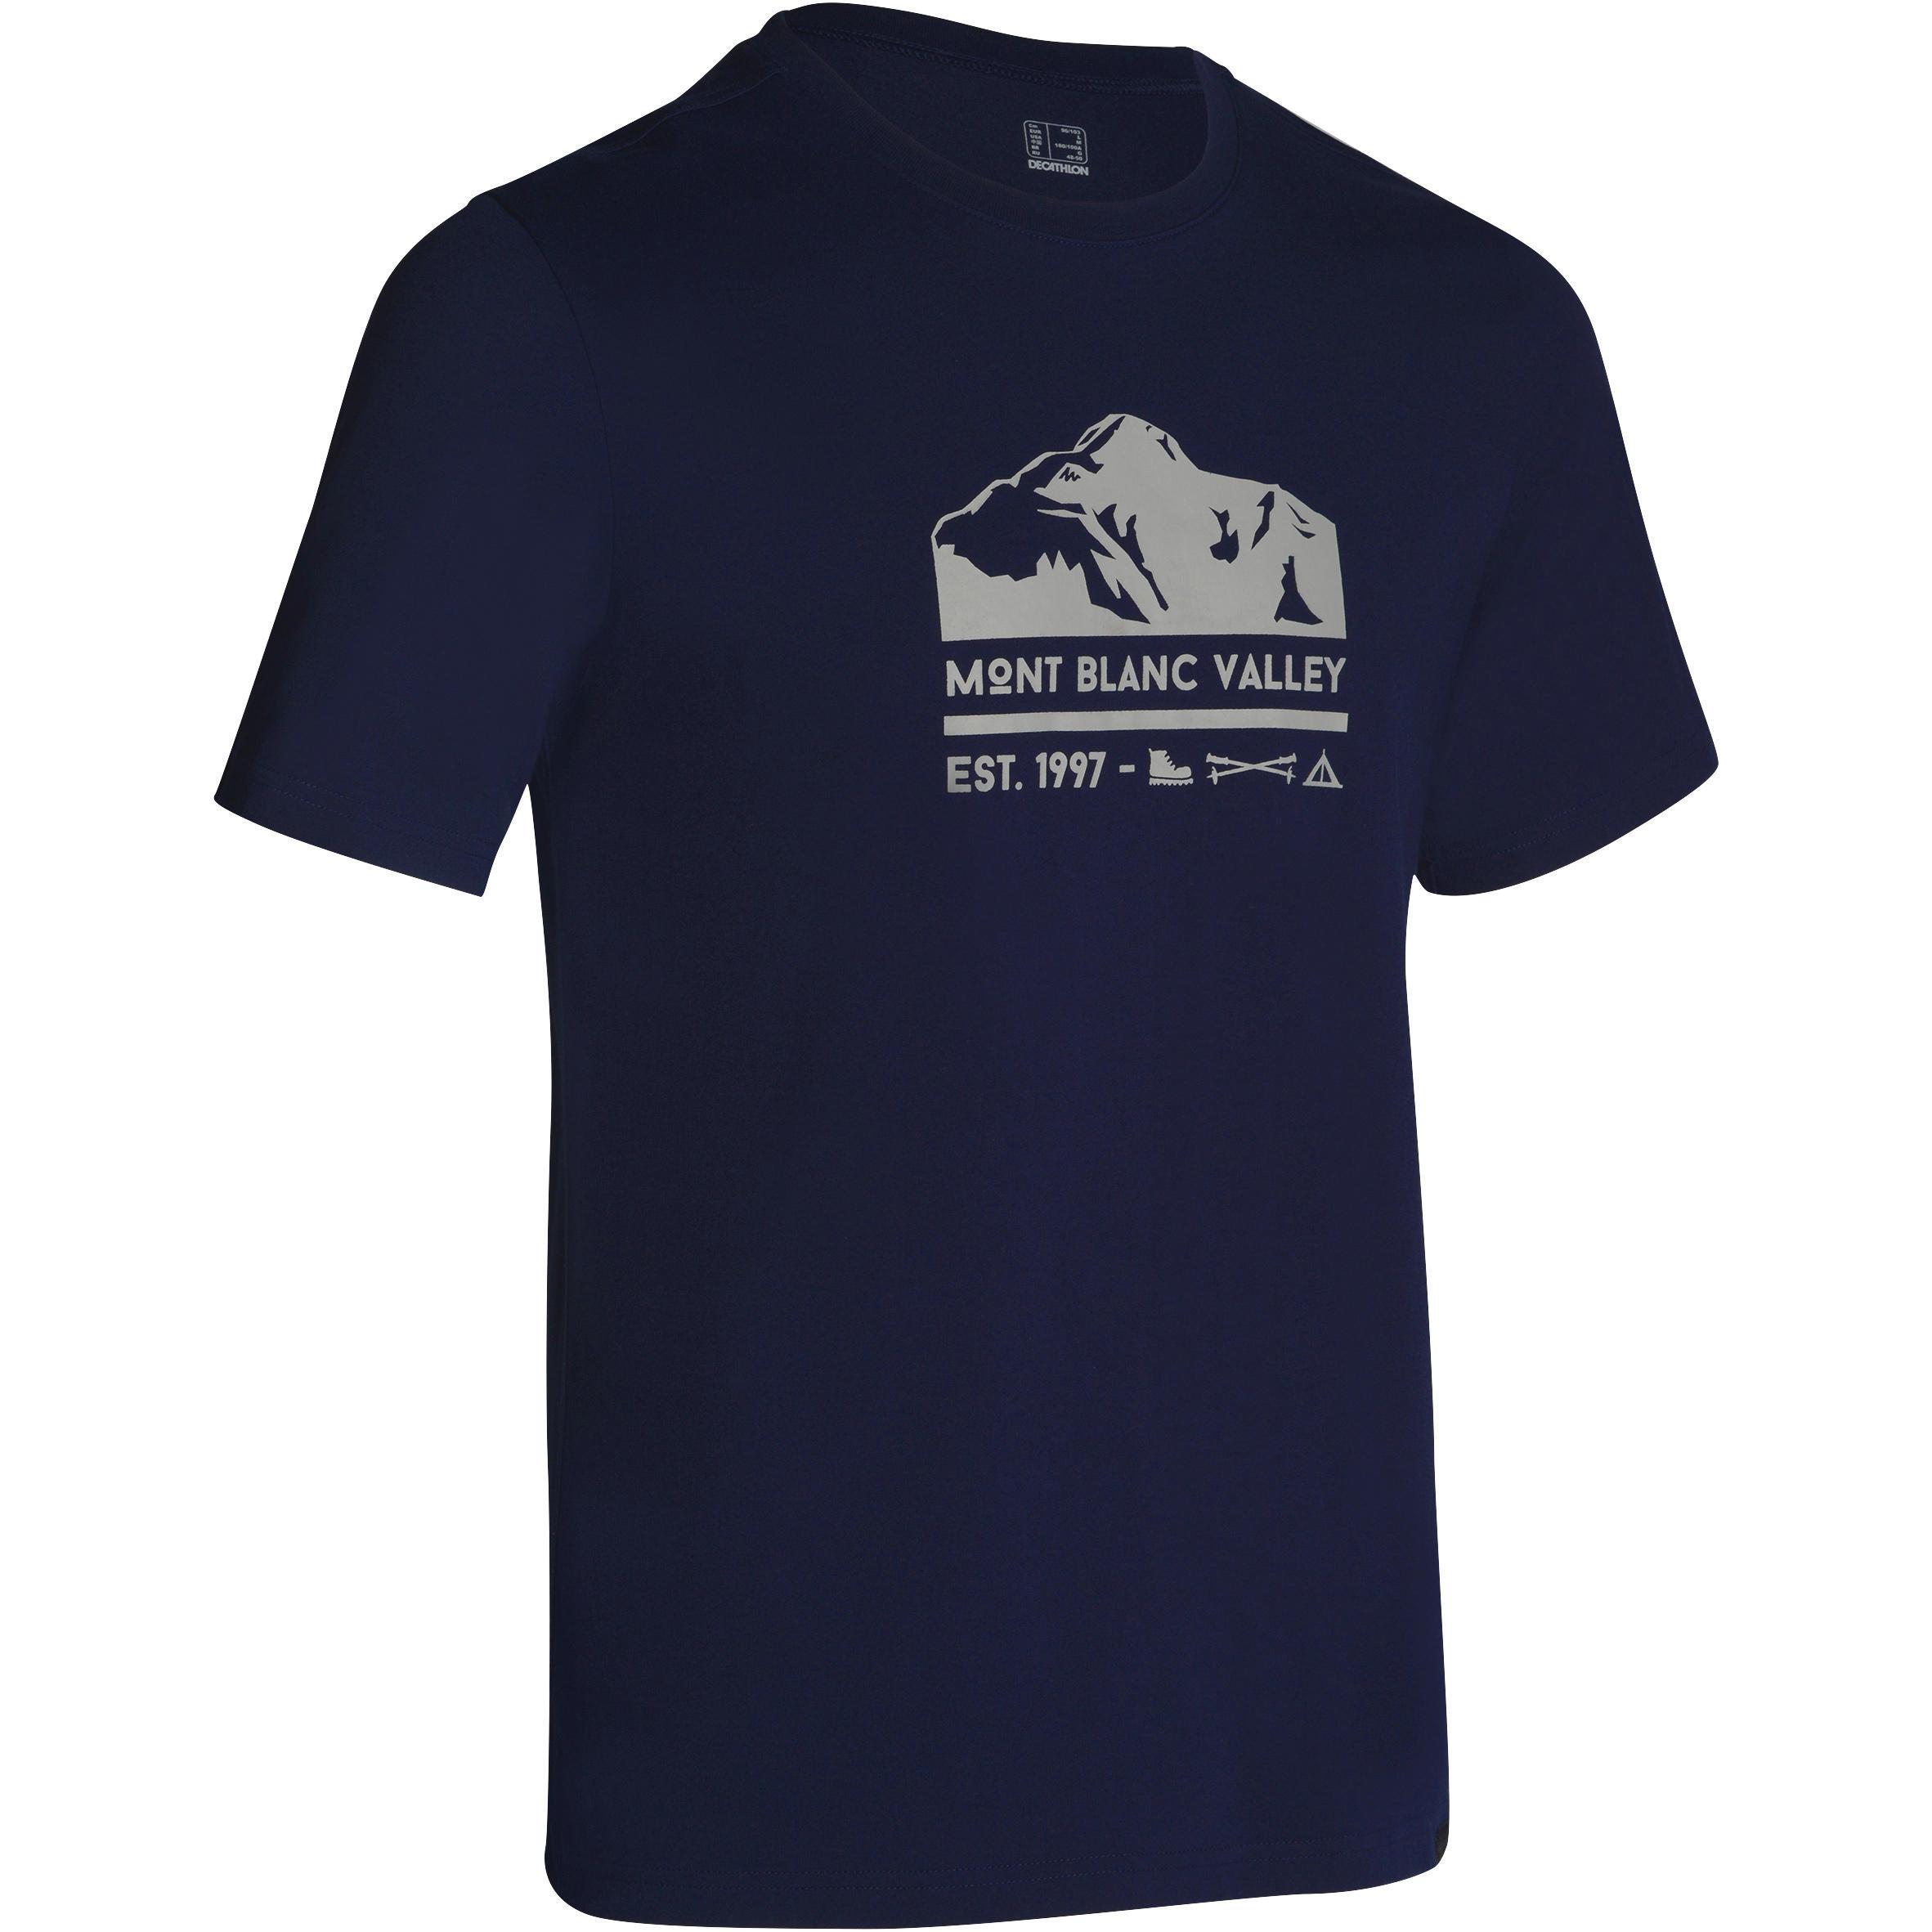 Camiseta manga corta travesía planicie hombre Tech TIL 100 azul marino